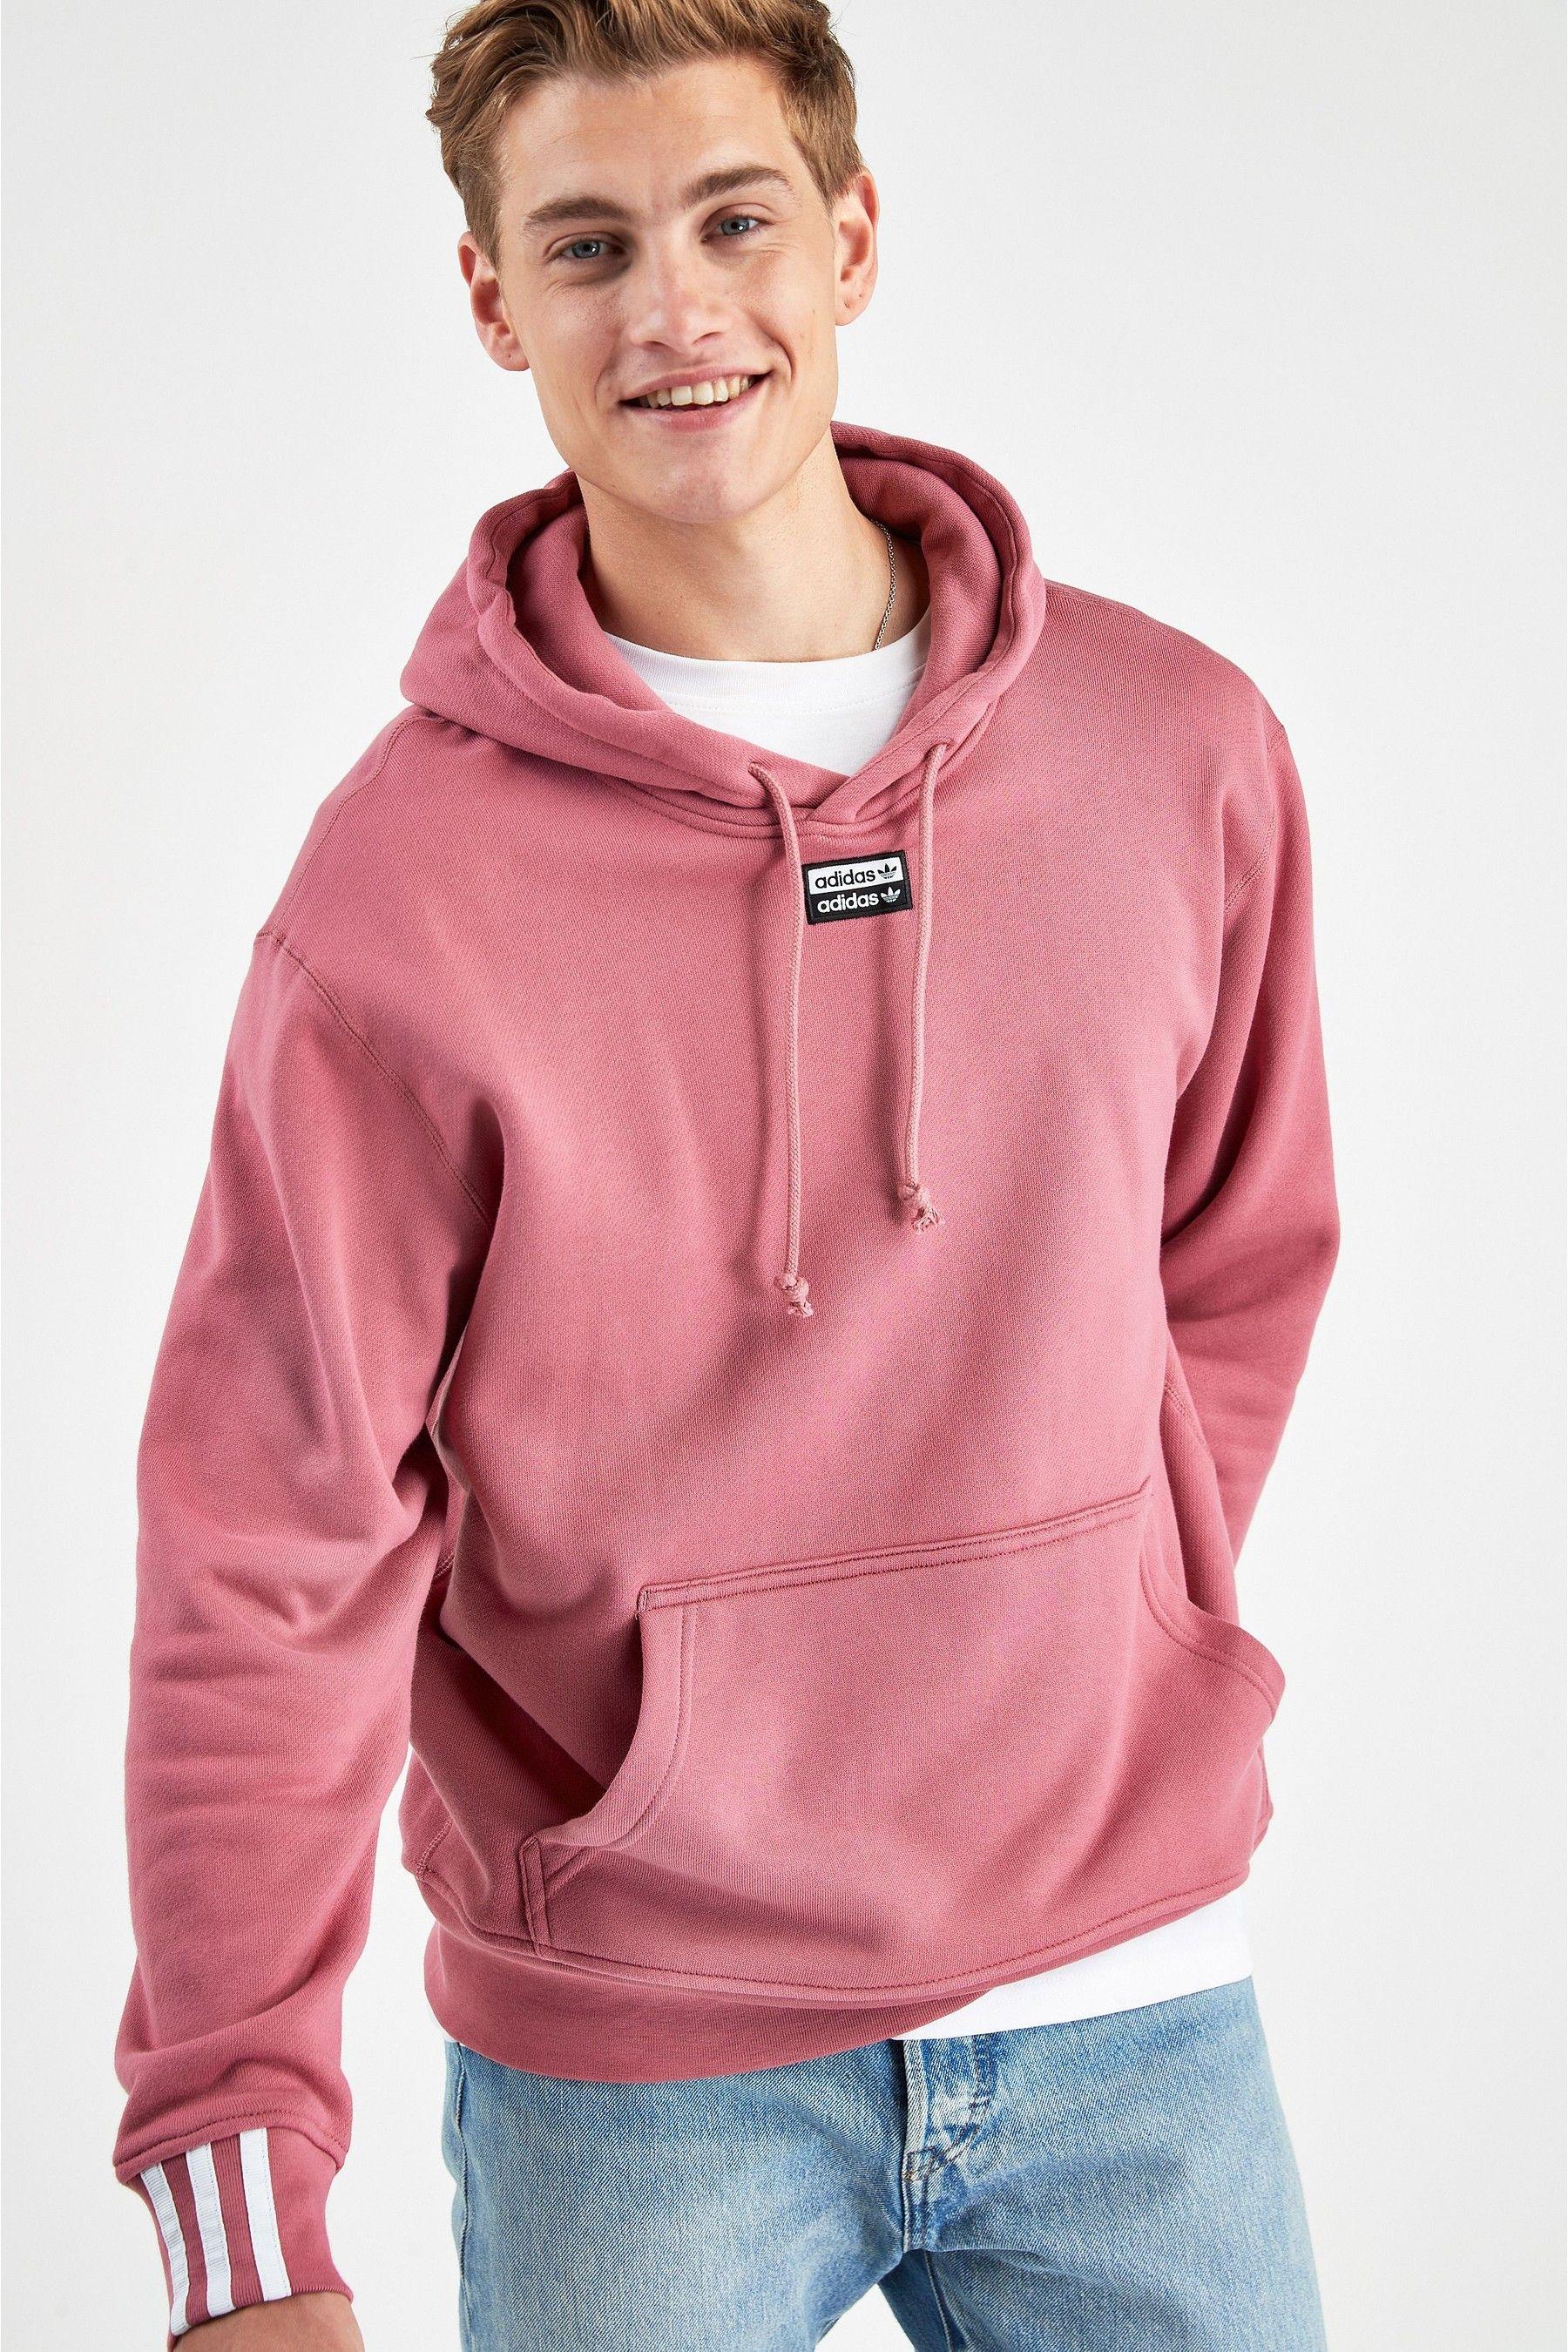 adidas Pink Sweats & Hoodies for Men for Sale | Shop Men's